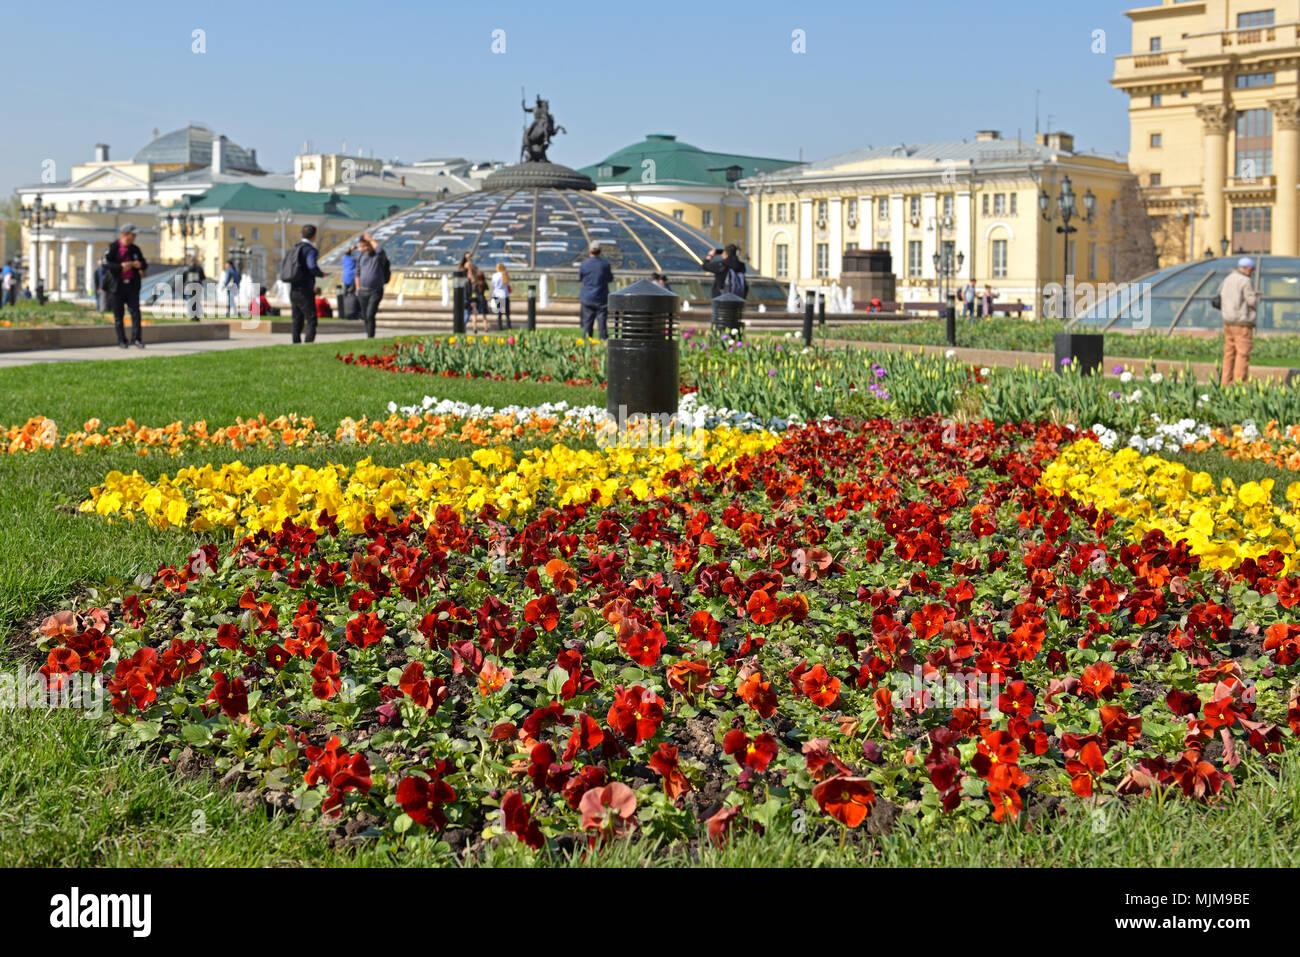 Flowers Pansies on Manege square - Stock Image